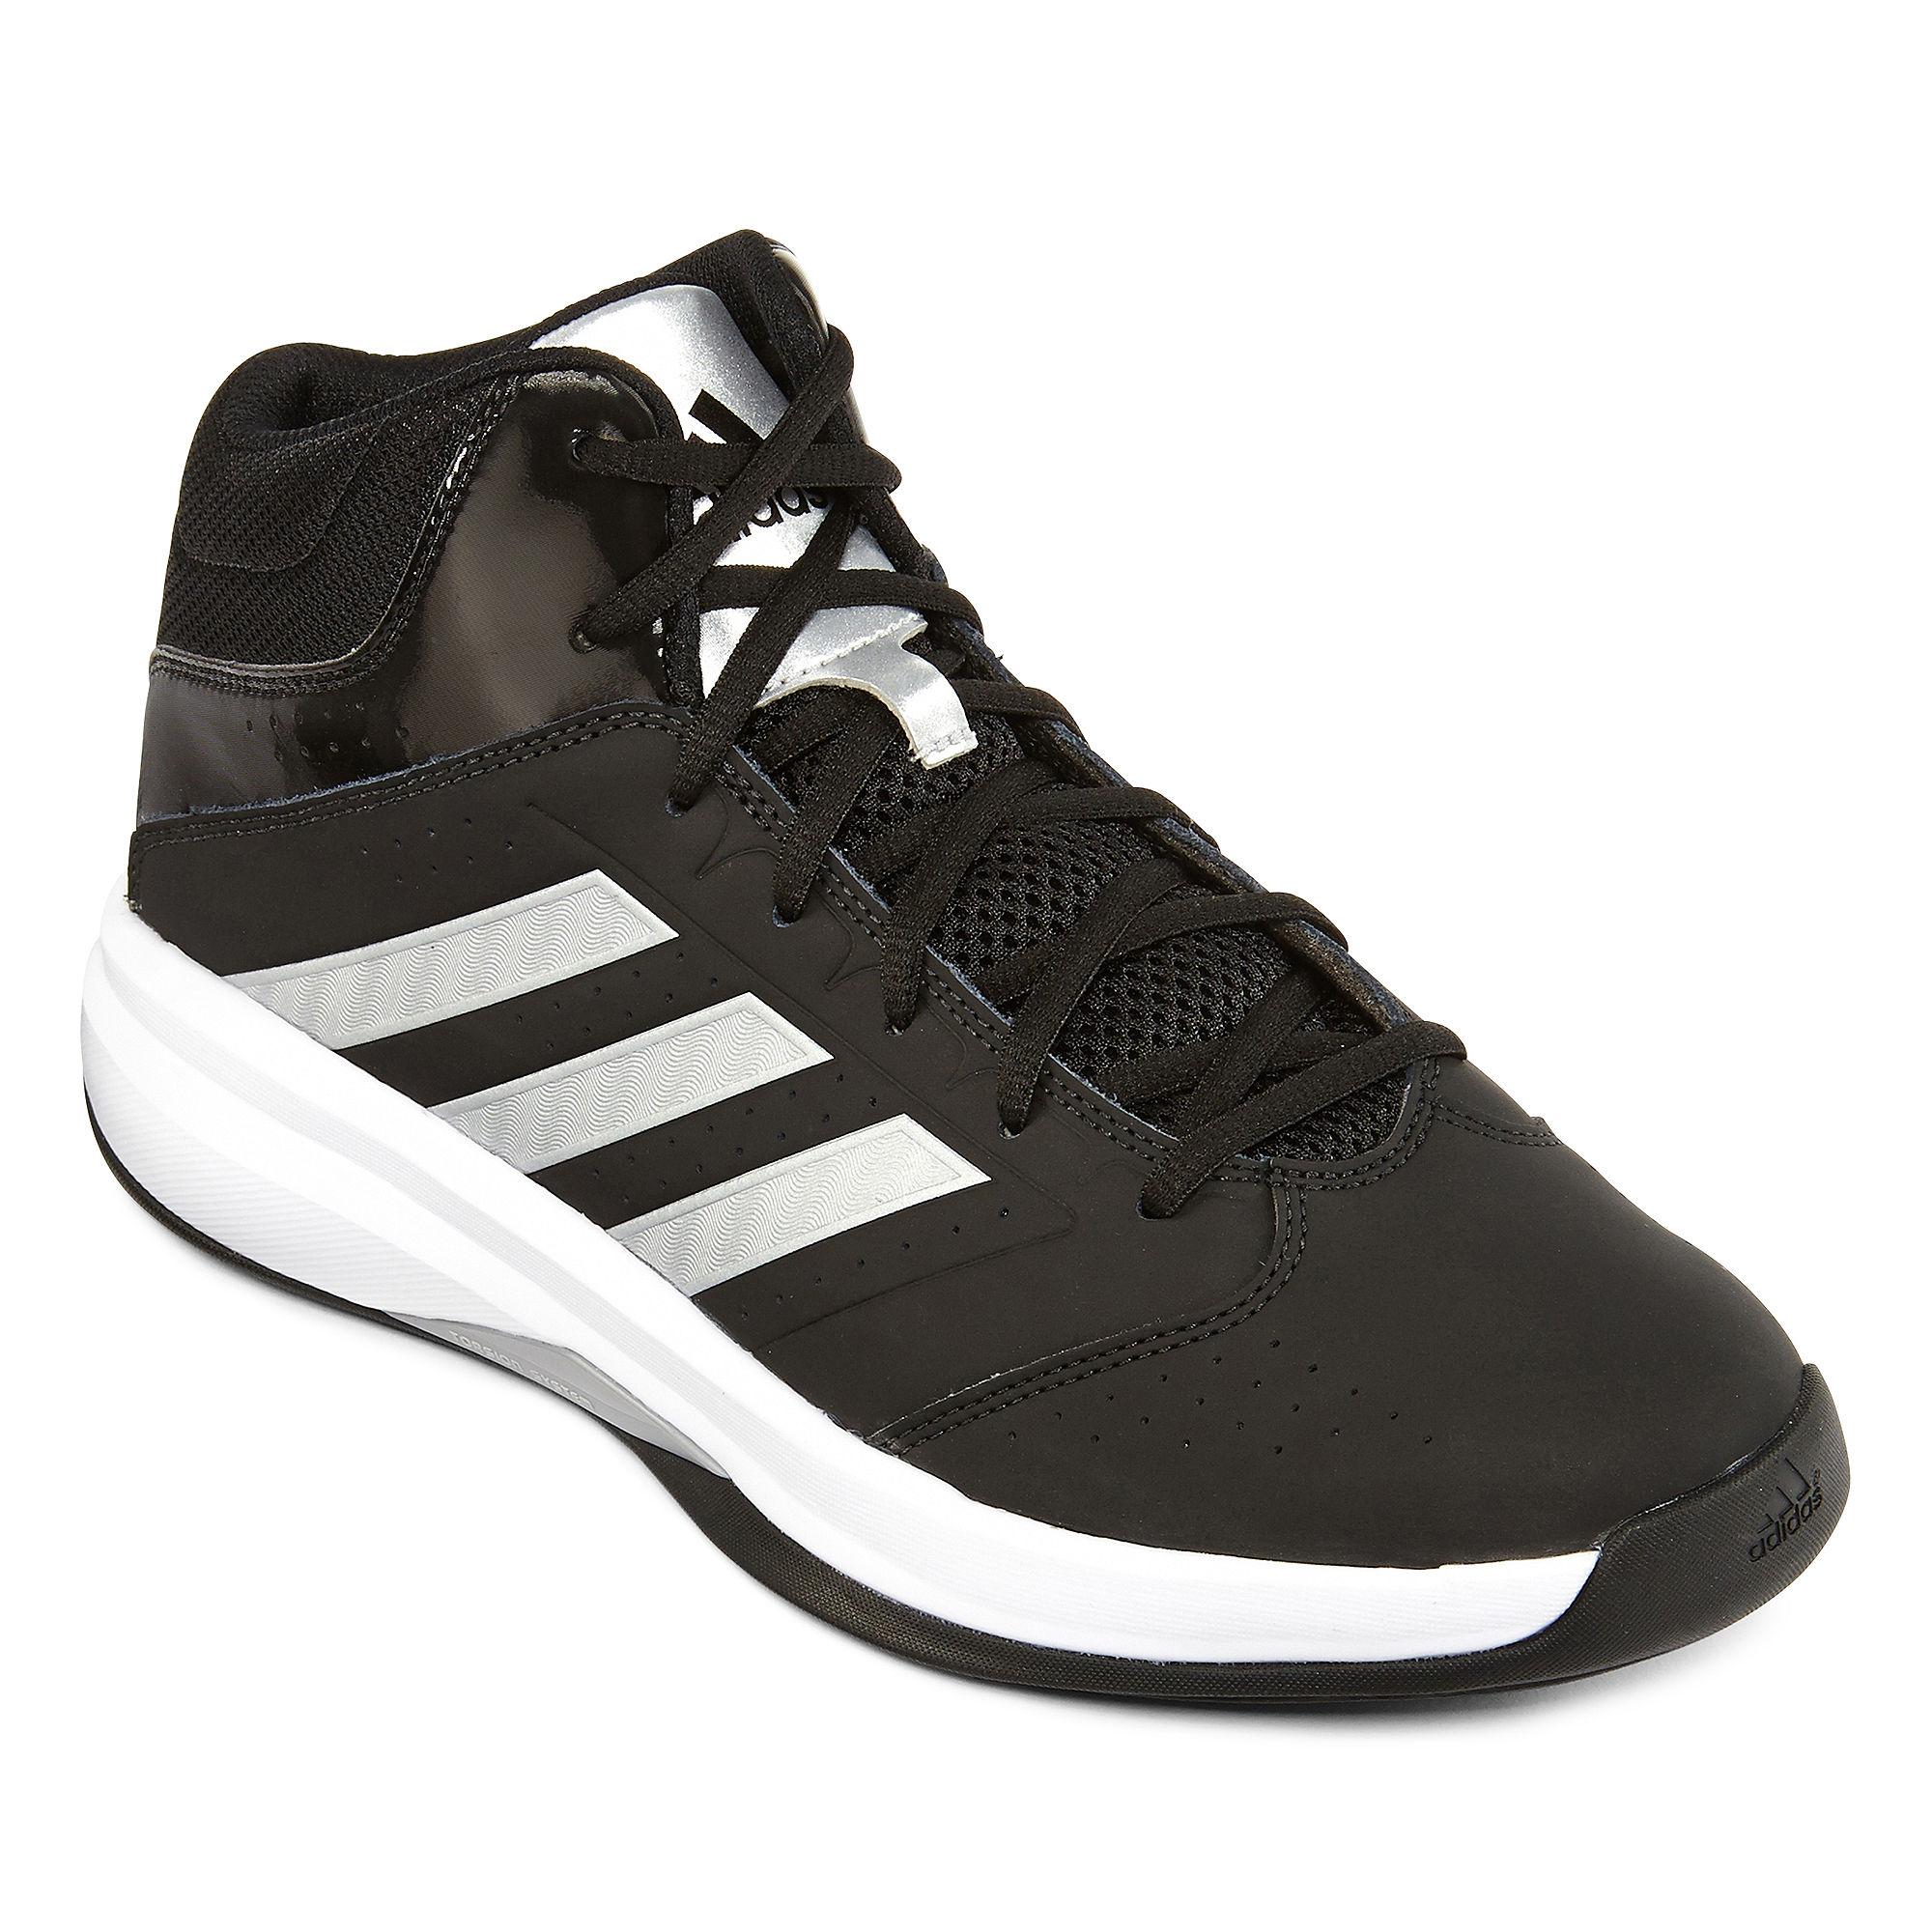 40fd7e28233e ... inexpensive upc 887383671122 product image for adidas isolation 2 mens  basketball shoes upcitemdb 74dfb 830b5